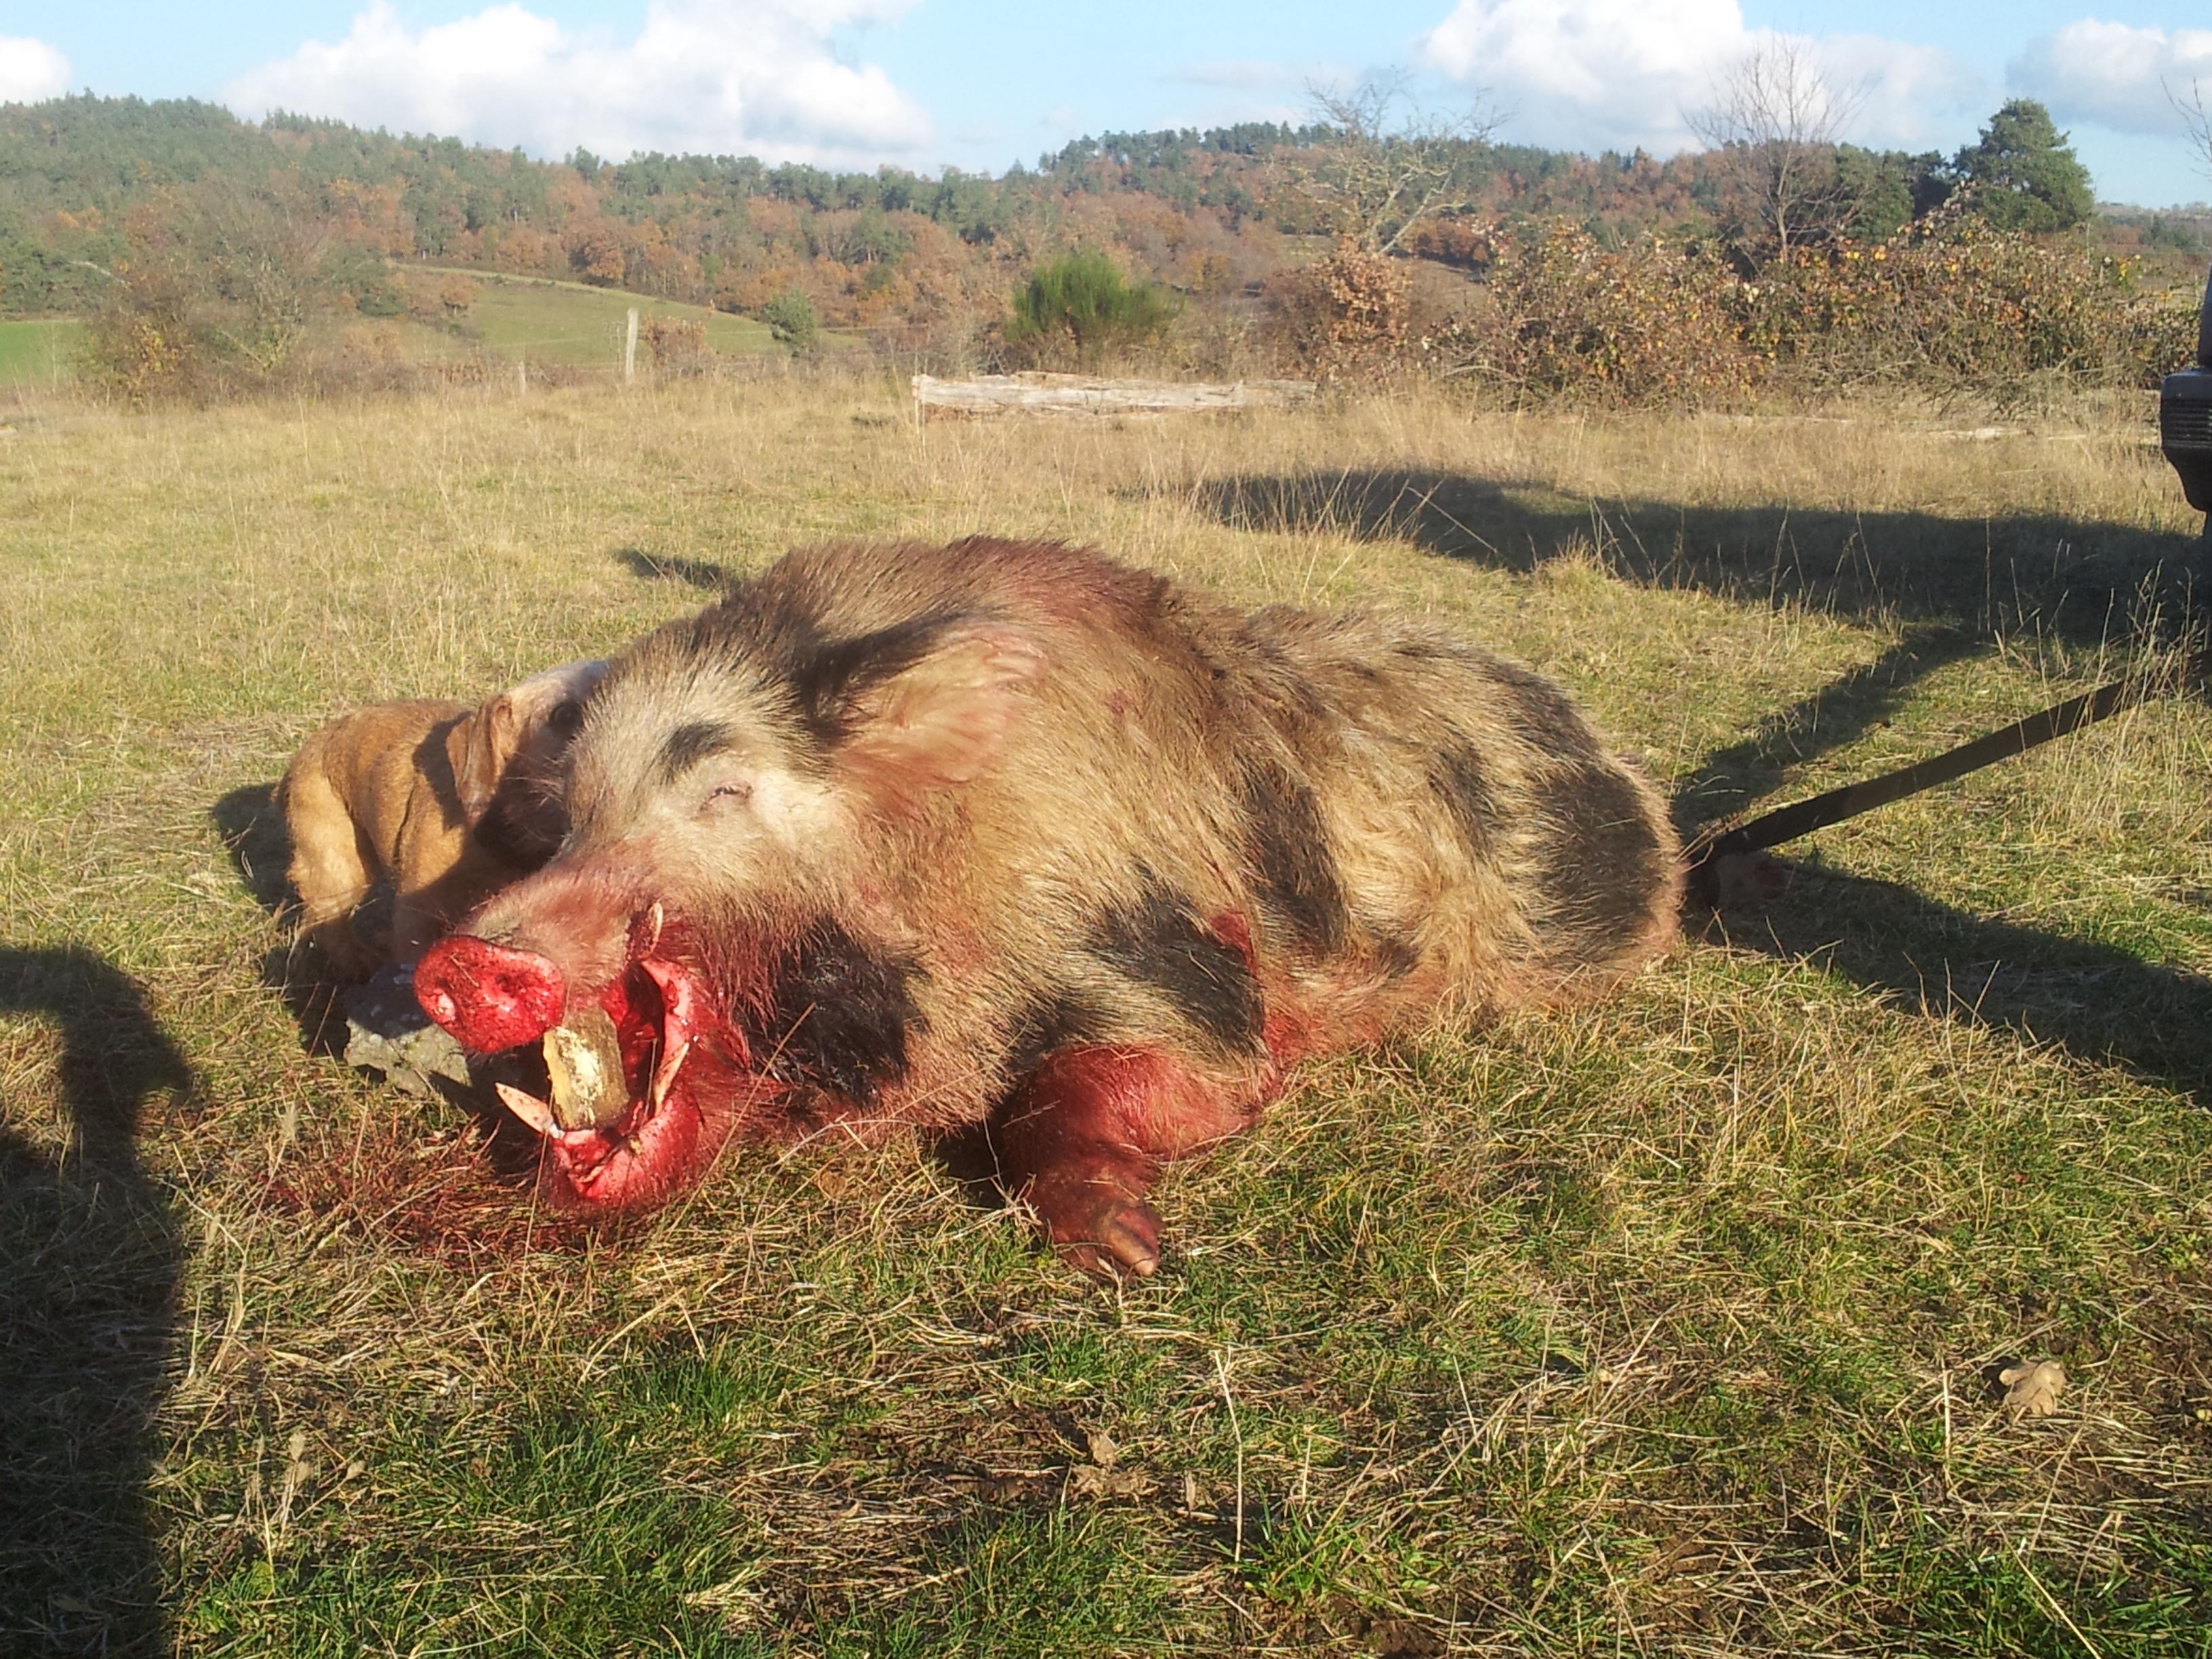 Saison de chasse au Grand Gibier 2012/2013 - Page 5 1353402857-android-image-11-20-2012